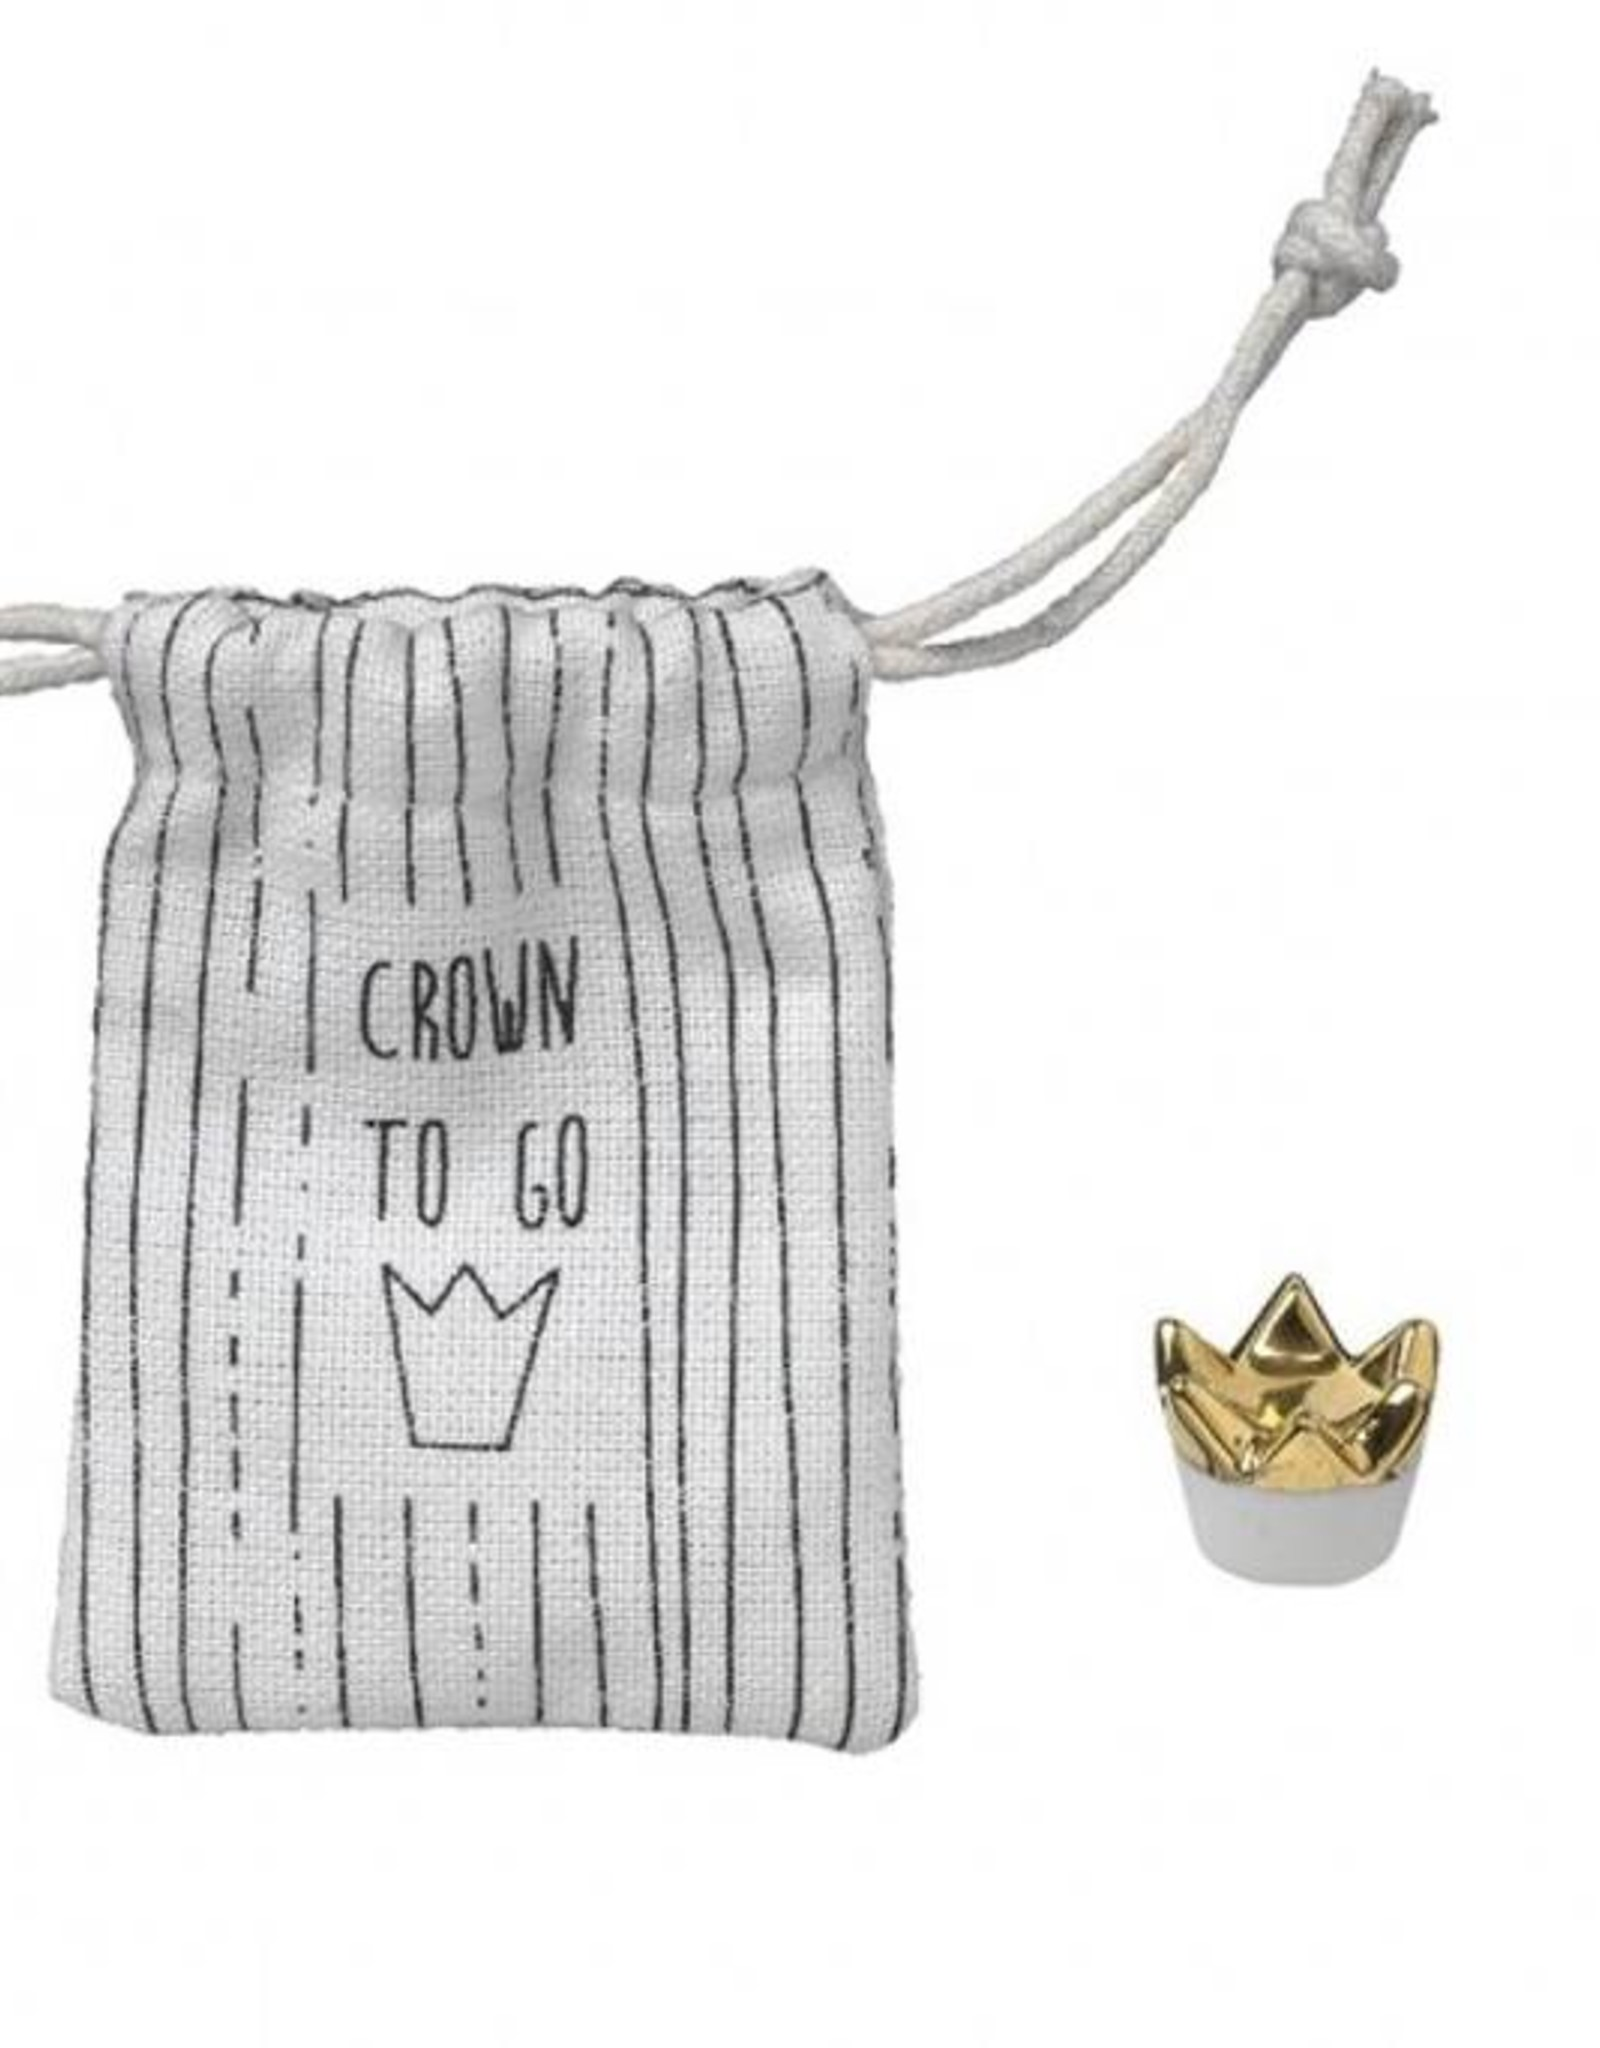 Räder Rader - Small pocket companion - Crown to go